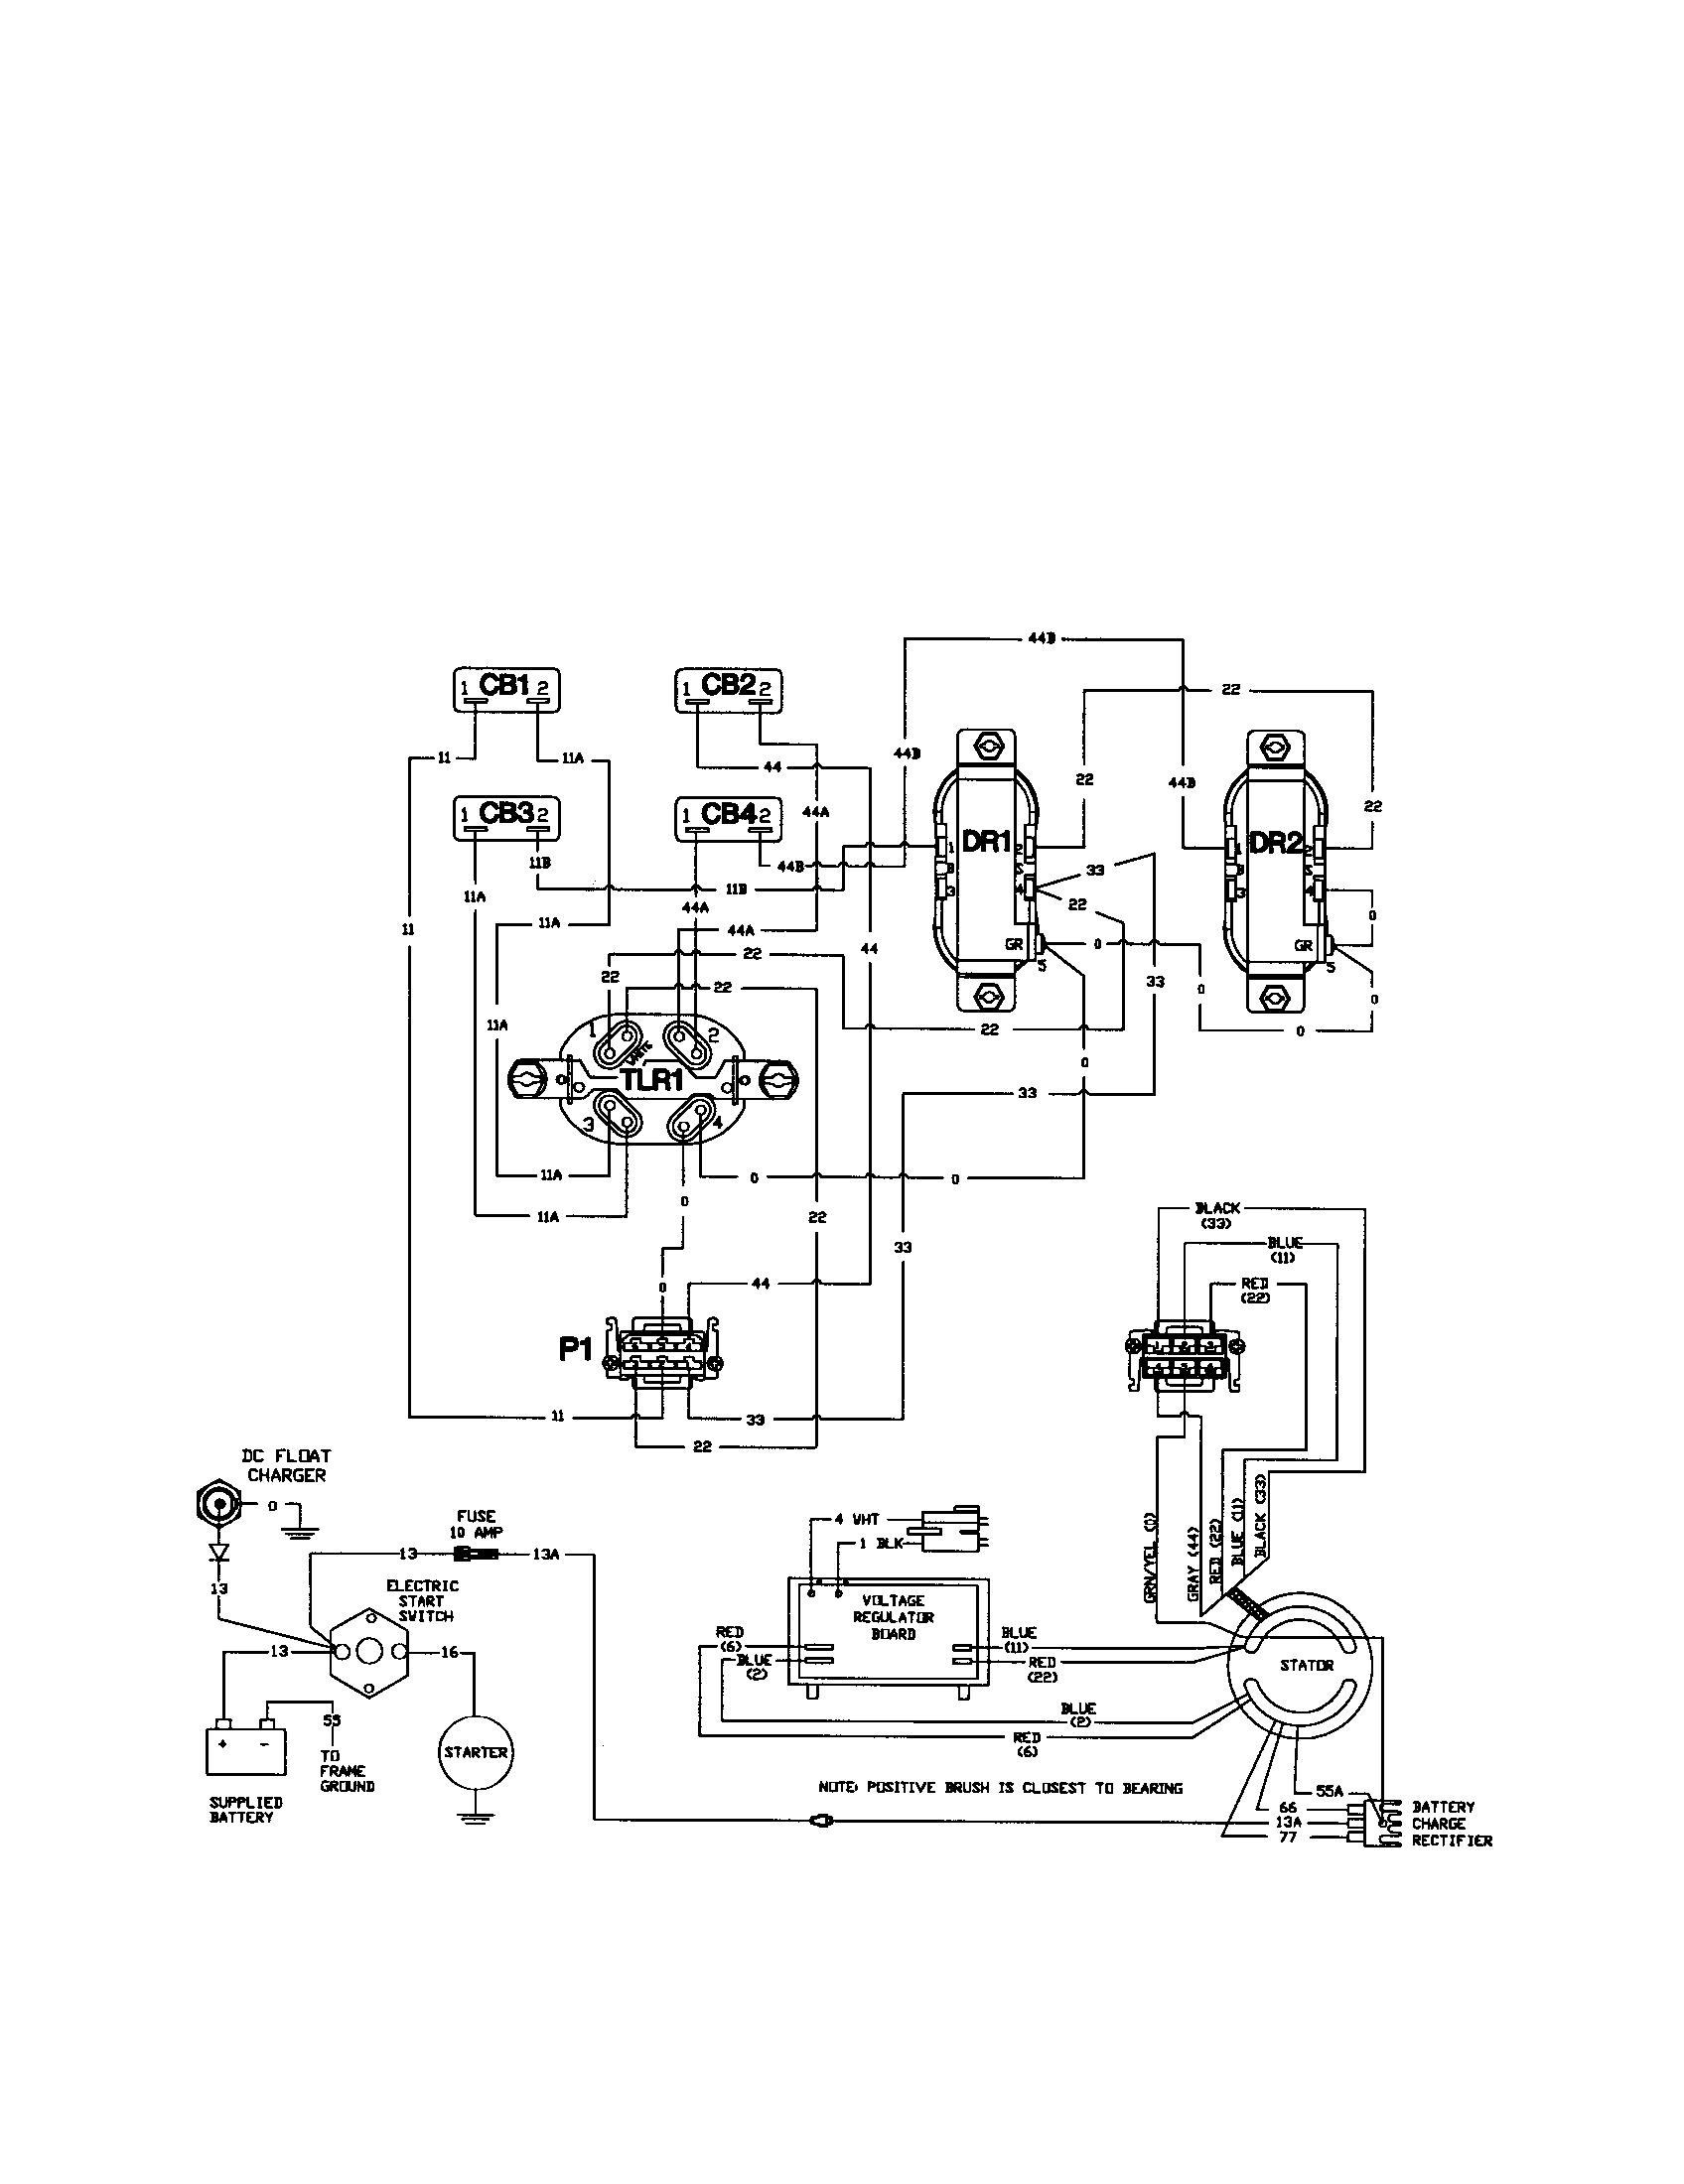 WIRING DIAGRAM Diagram & Parts List for Model 01893 BRIGGS